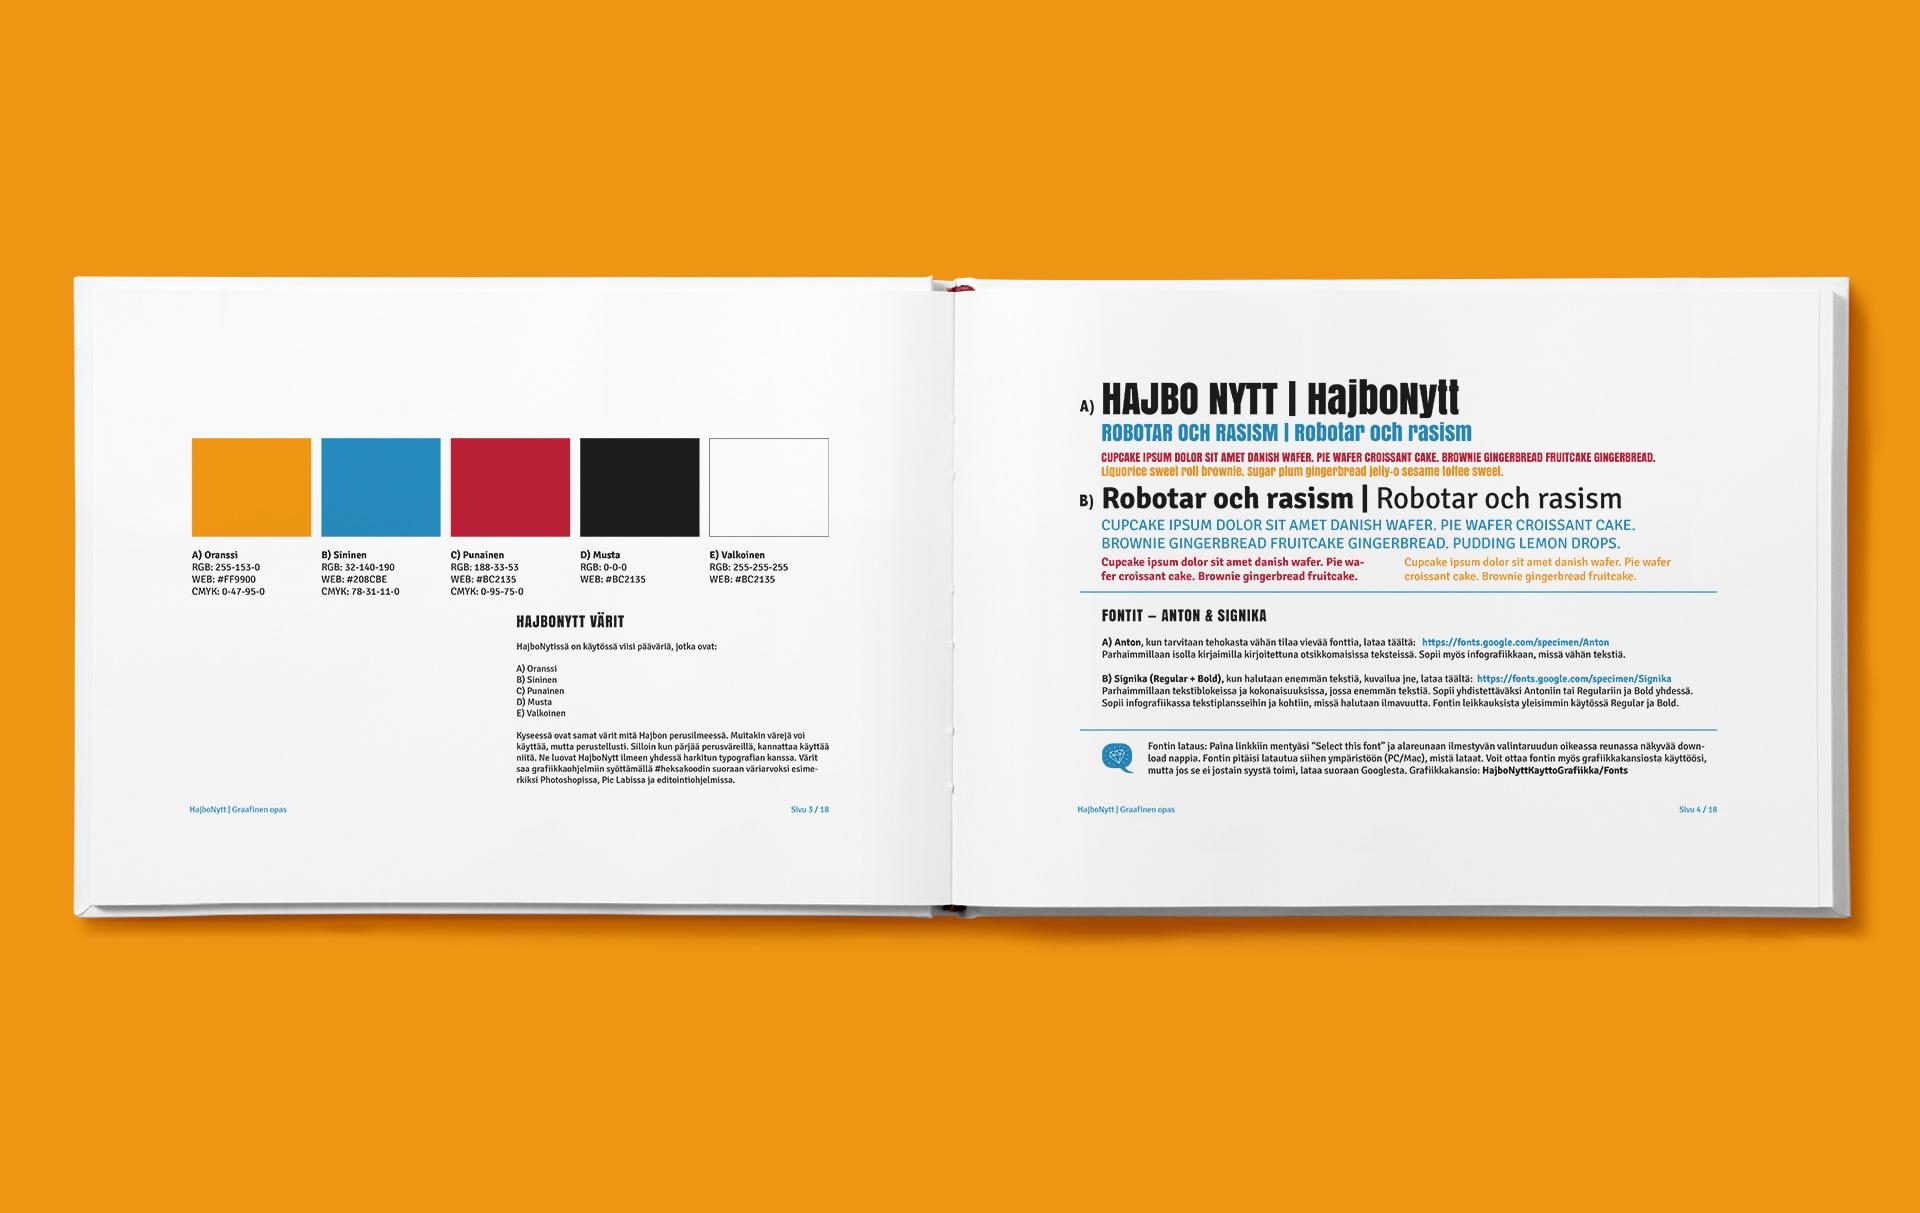 HajboNytt-graafOhje-Kirja-Rajattu2.jpg